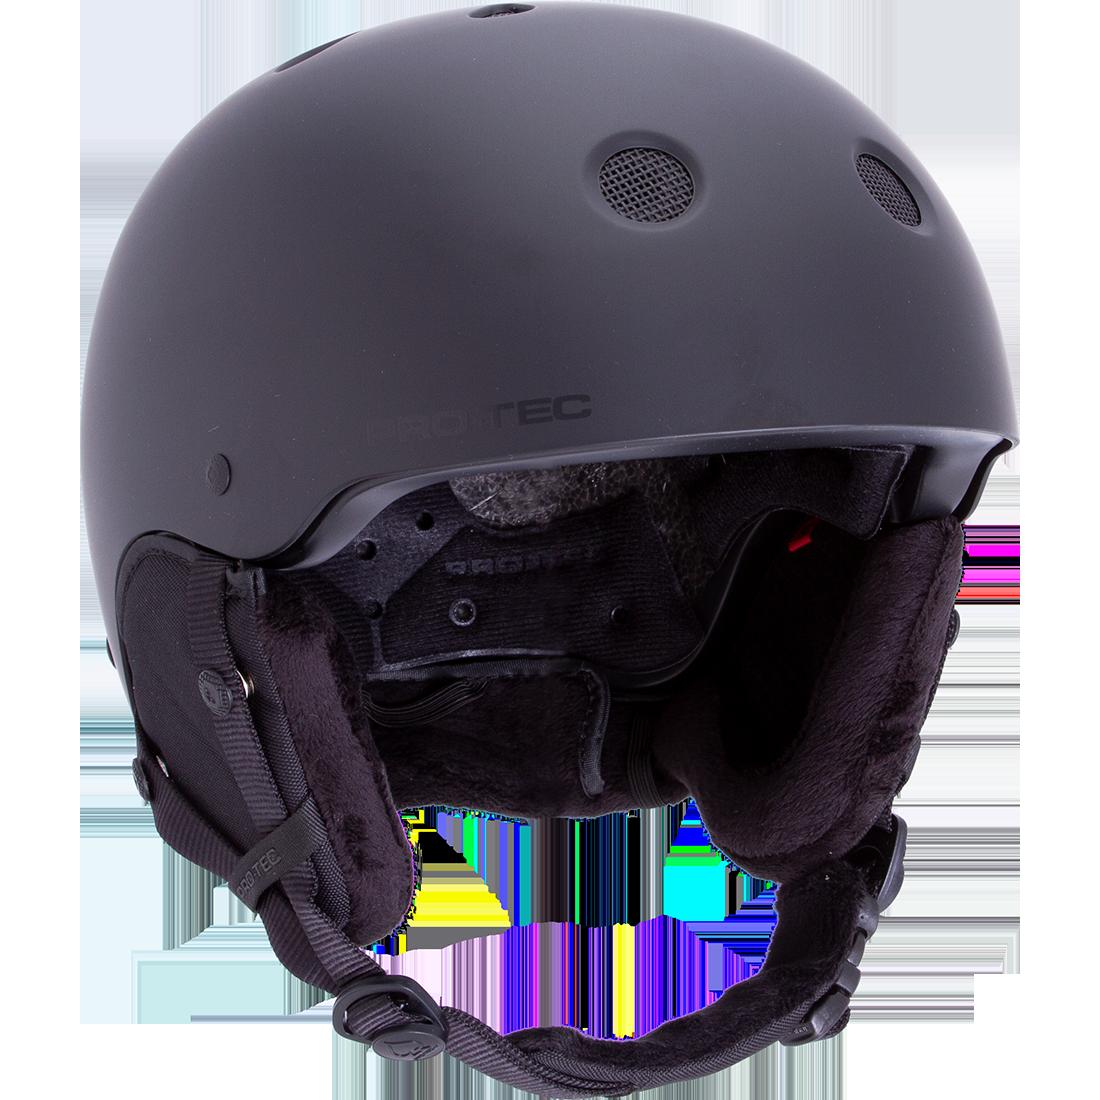 Pro-Tec Classic Certified Snow Helmet Stealth Black